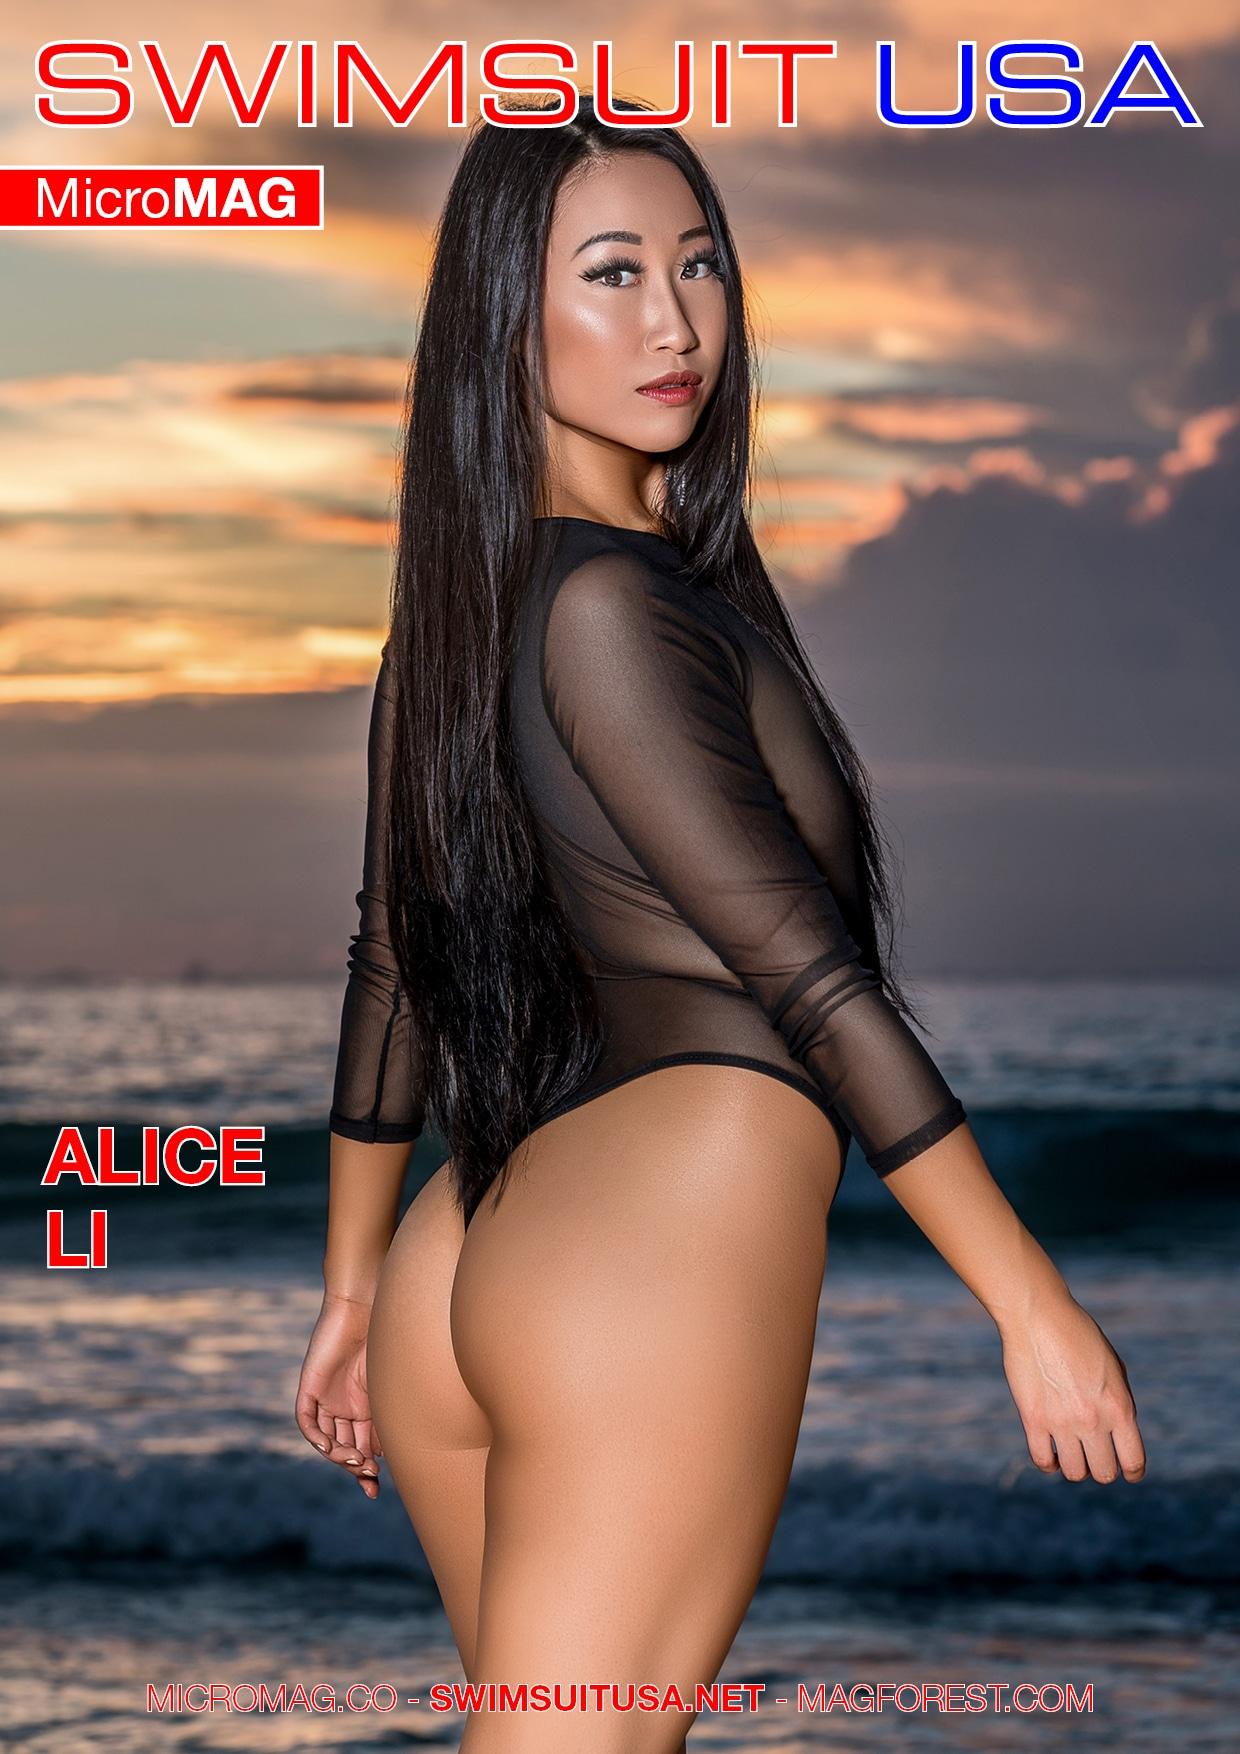 Swimsuit USA MicroMAG - Alice Li